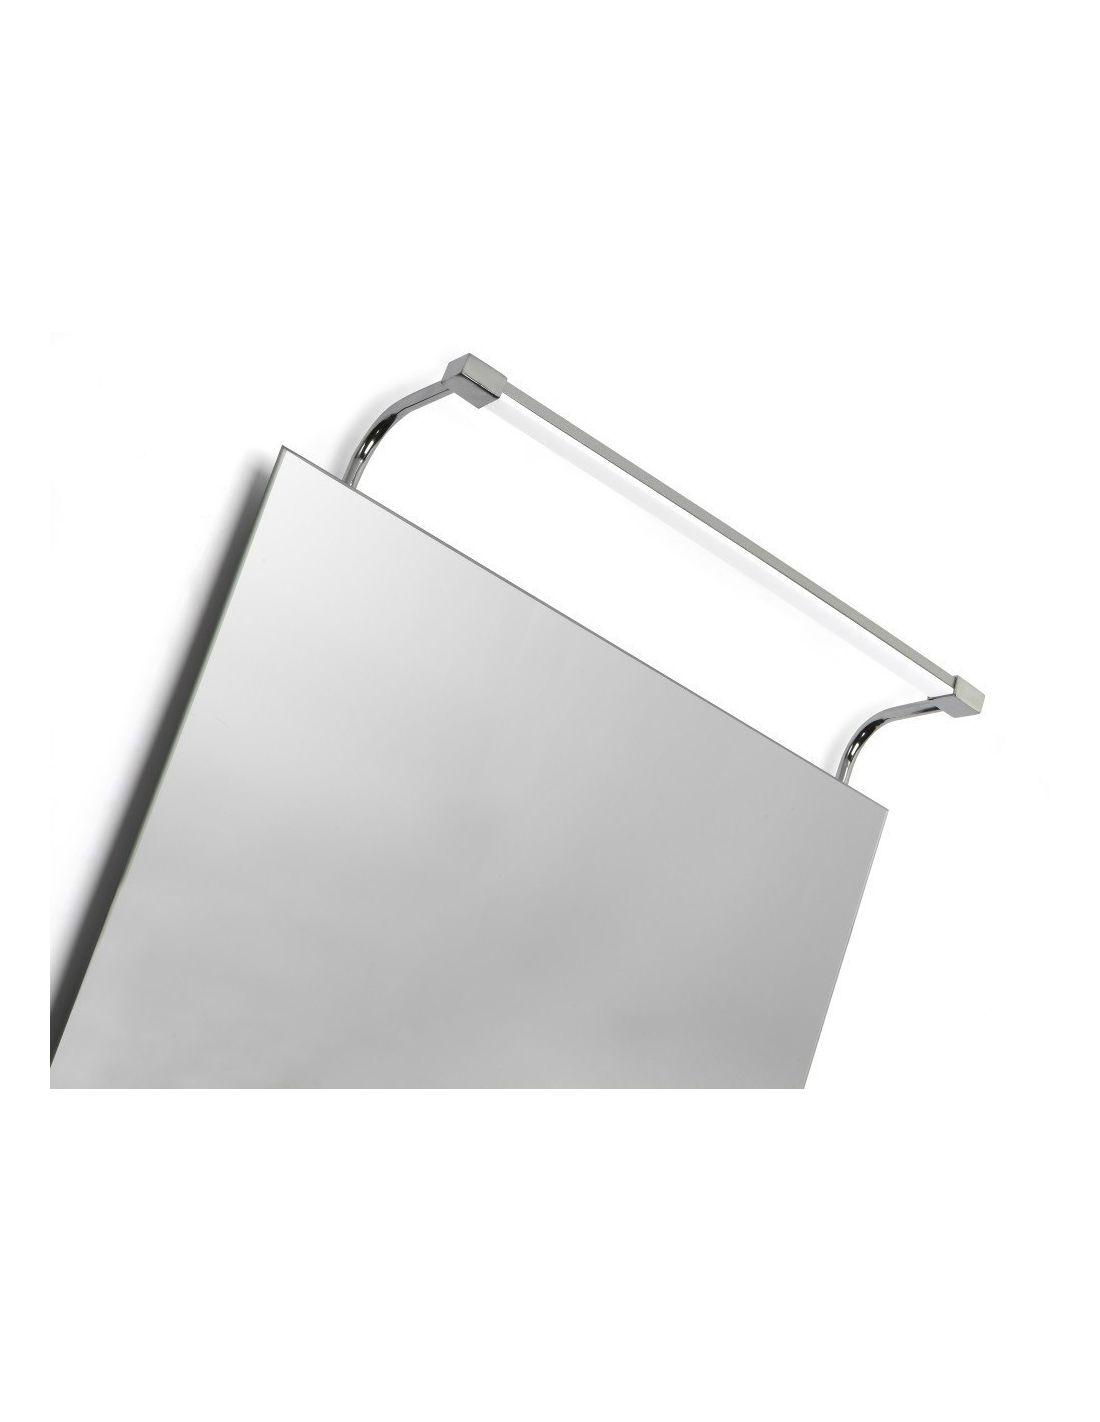 Aplique espejo ba o sisley mantra env o gratis - Aplique espejo bano ...